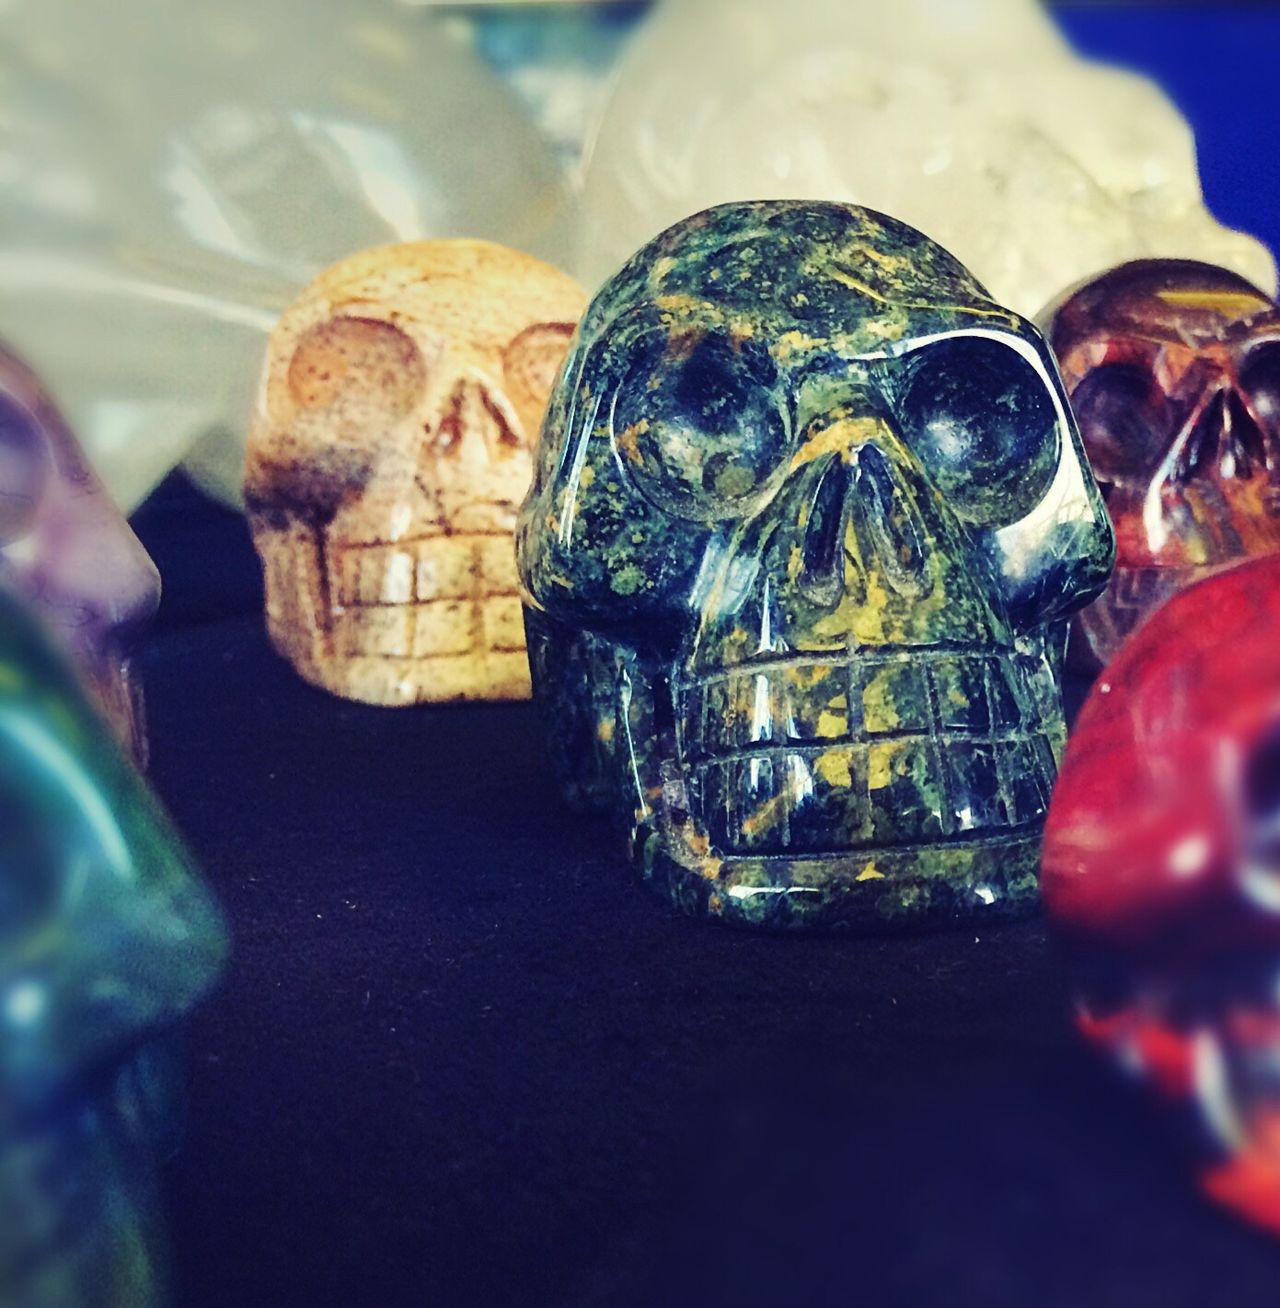 Crystal Skulls Semi-precious Stones Carved Semiprecious Stones